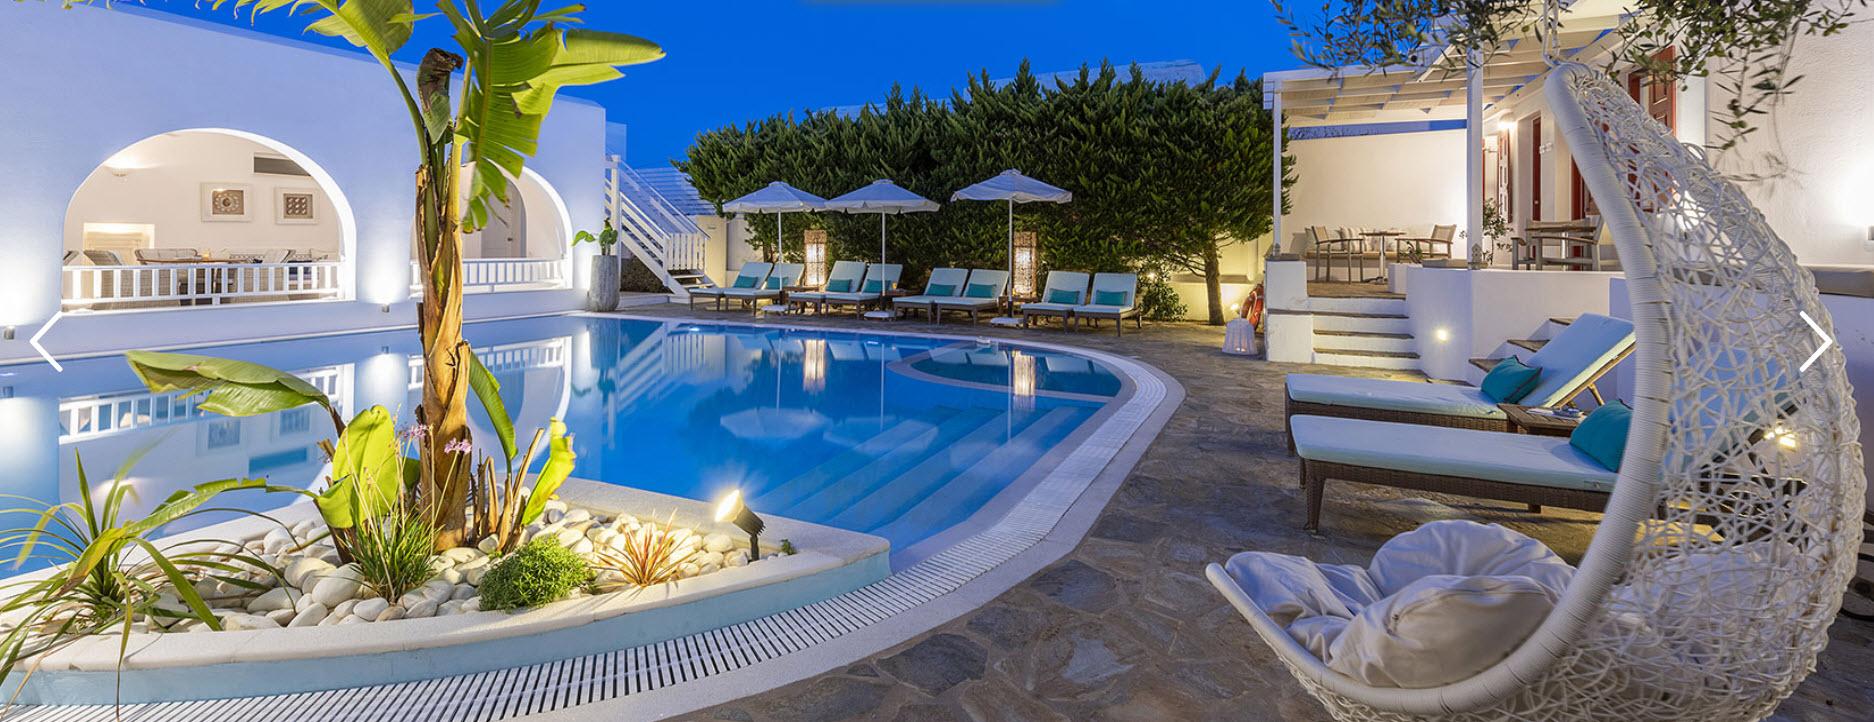 Stelia Mare Boutique Hotel - Πάρος ✦ 2 Ημέρες (1 Διανυκτέρευση) ✦ 2 άτομα ✦ Πρωινό ✦ 01/07/2021 έως 31/07/2021 ✦ Μπροστά στην παραλία!